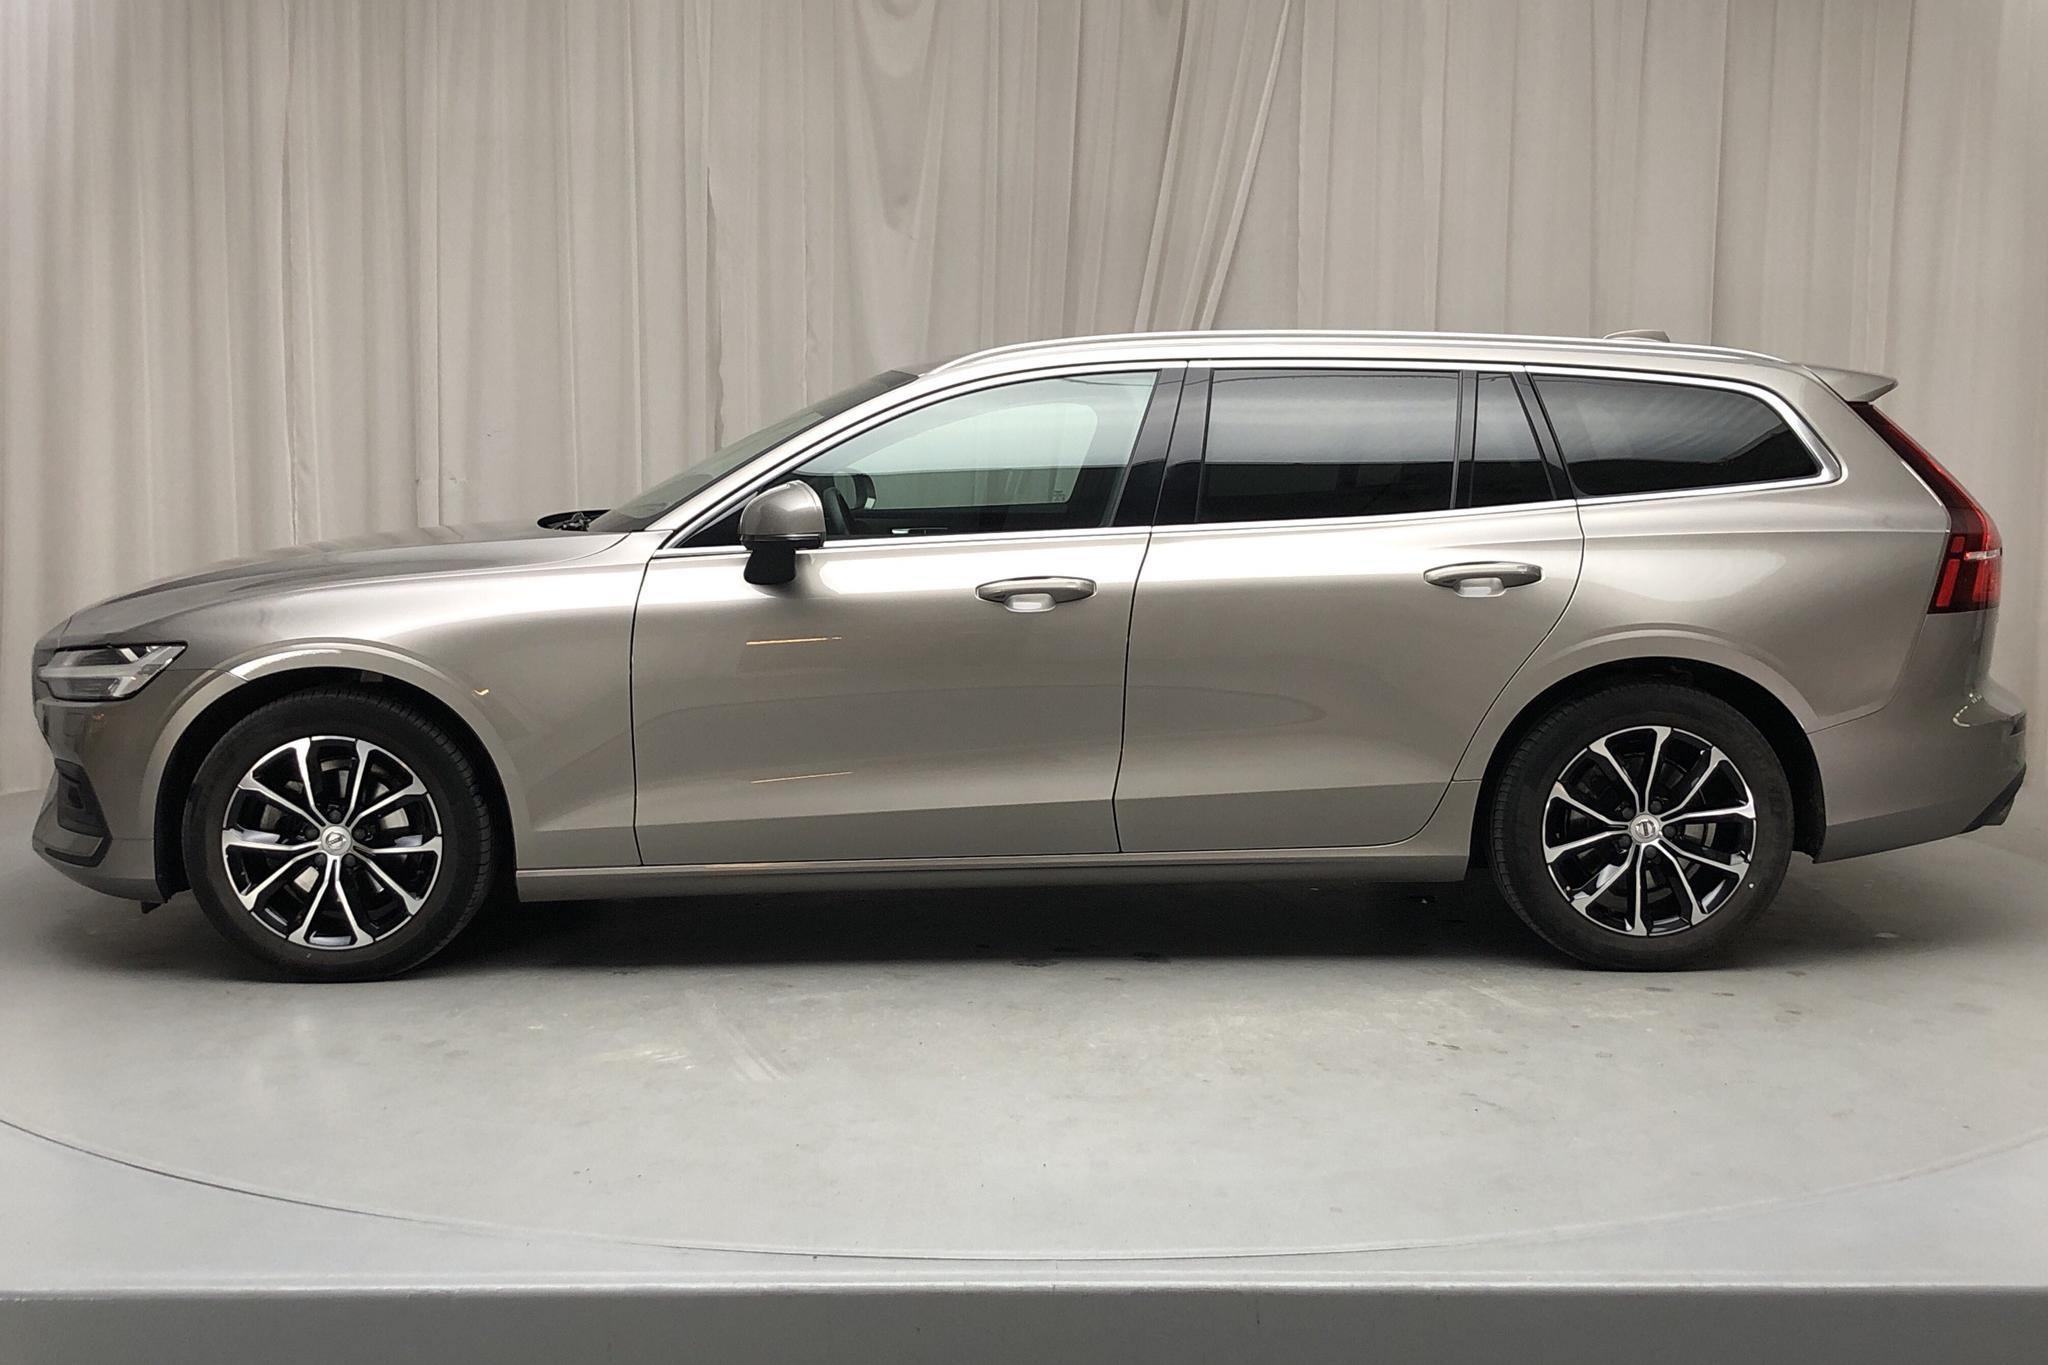 Volvo V60 D4 (190hk) - 54 670 km - Automatic - gray - 2019